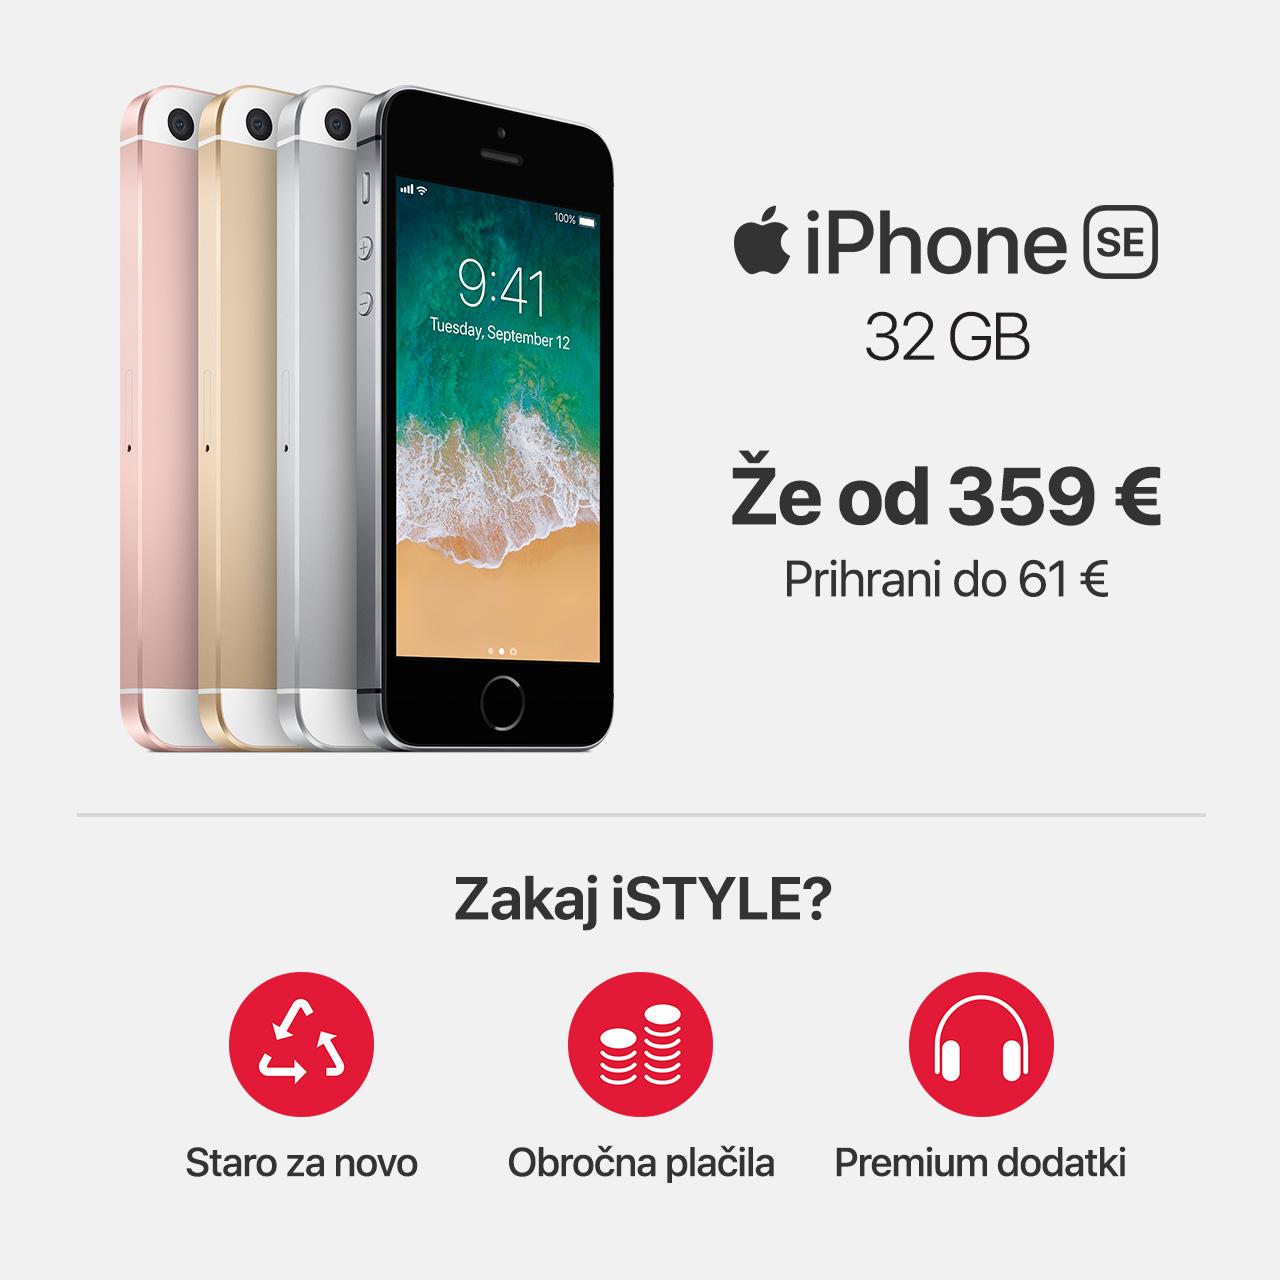 SI - iPhone SE